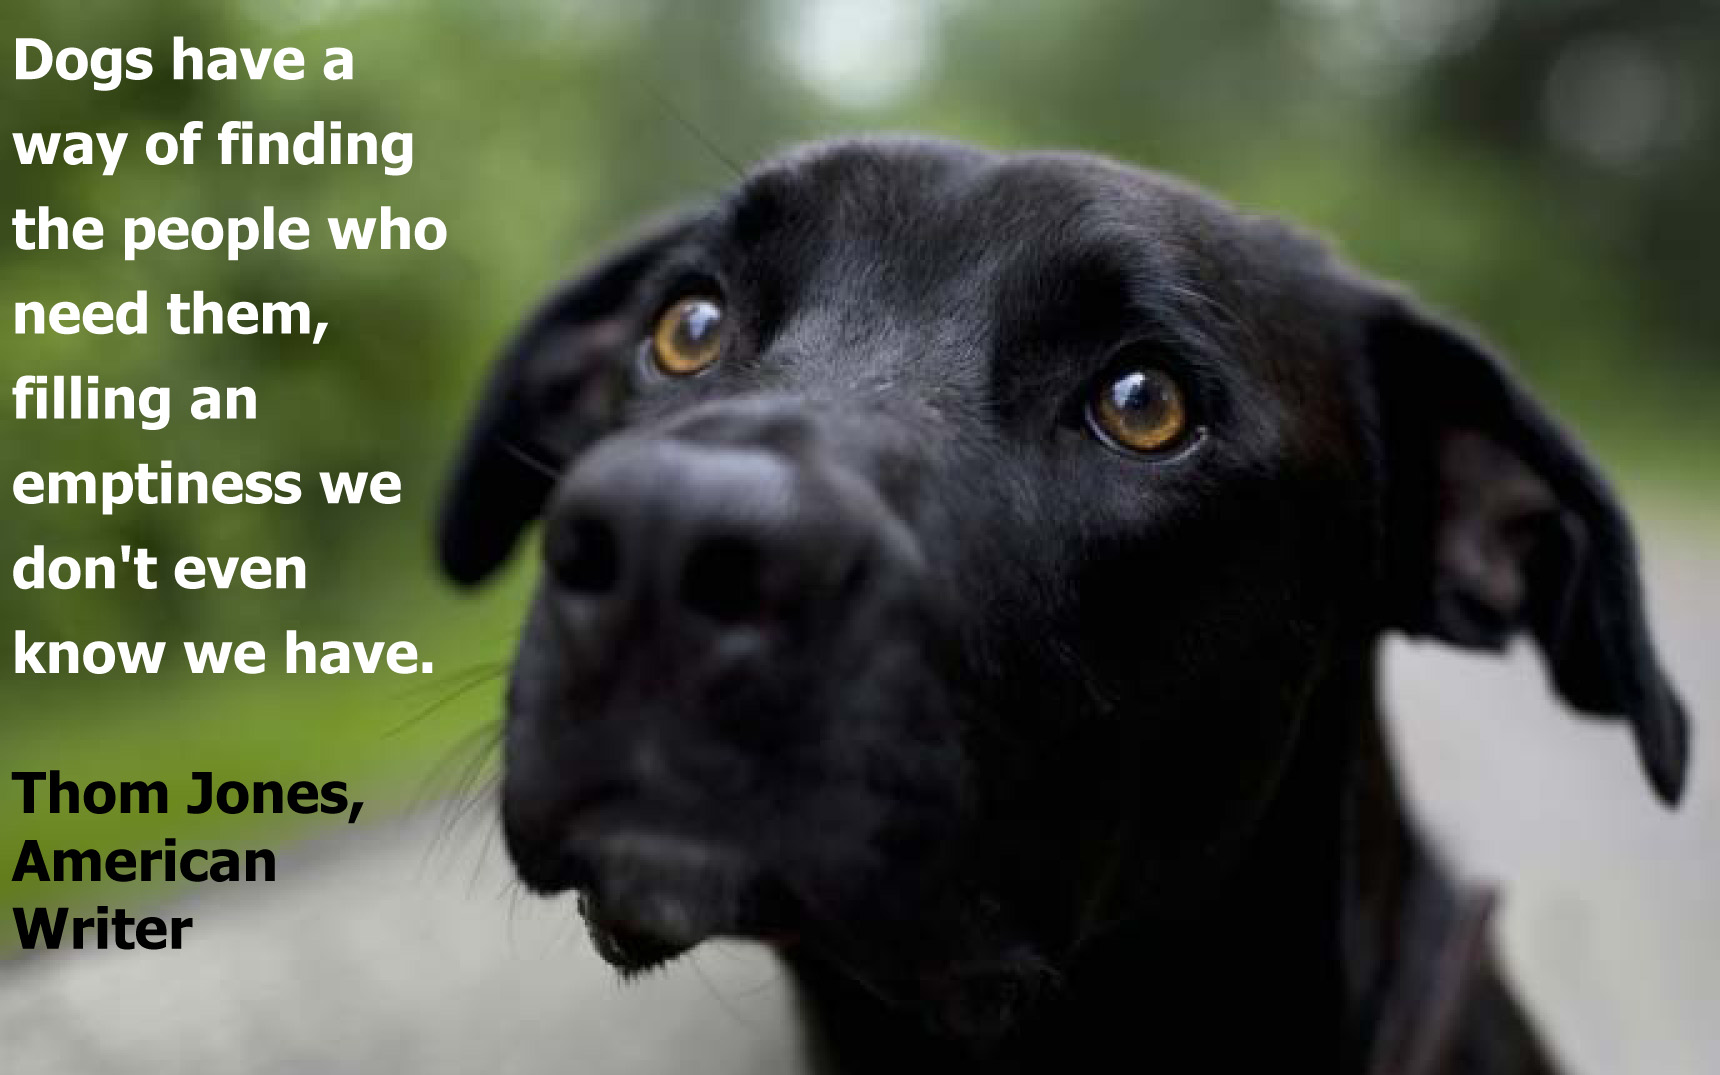 When A Dog Dies Quotes Quotesgram: Best Dog Quotes. QuotesGram